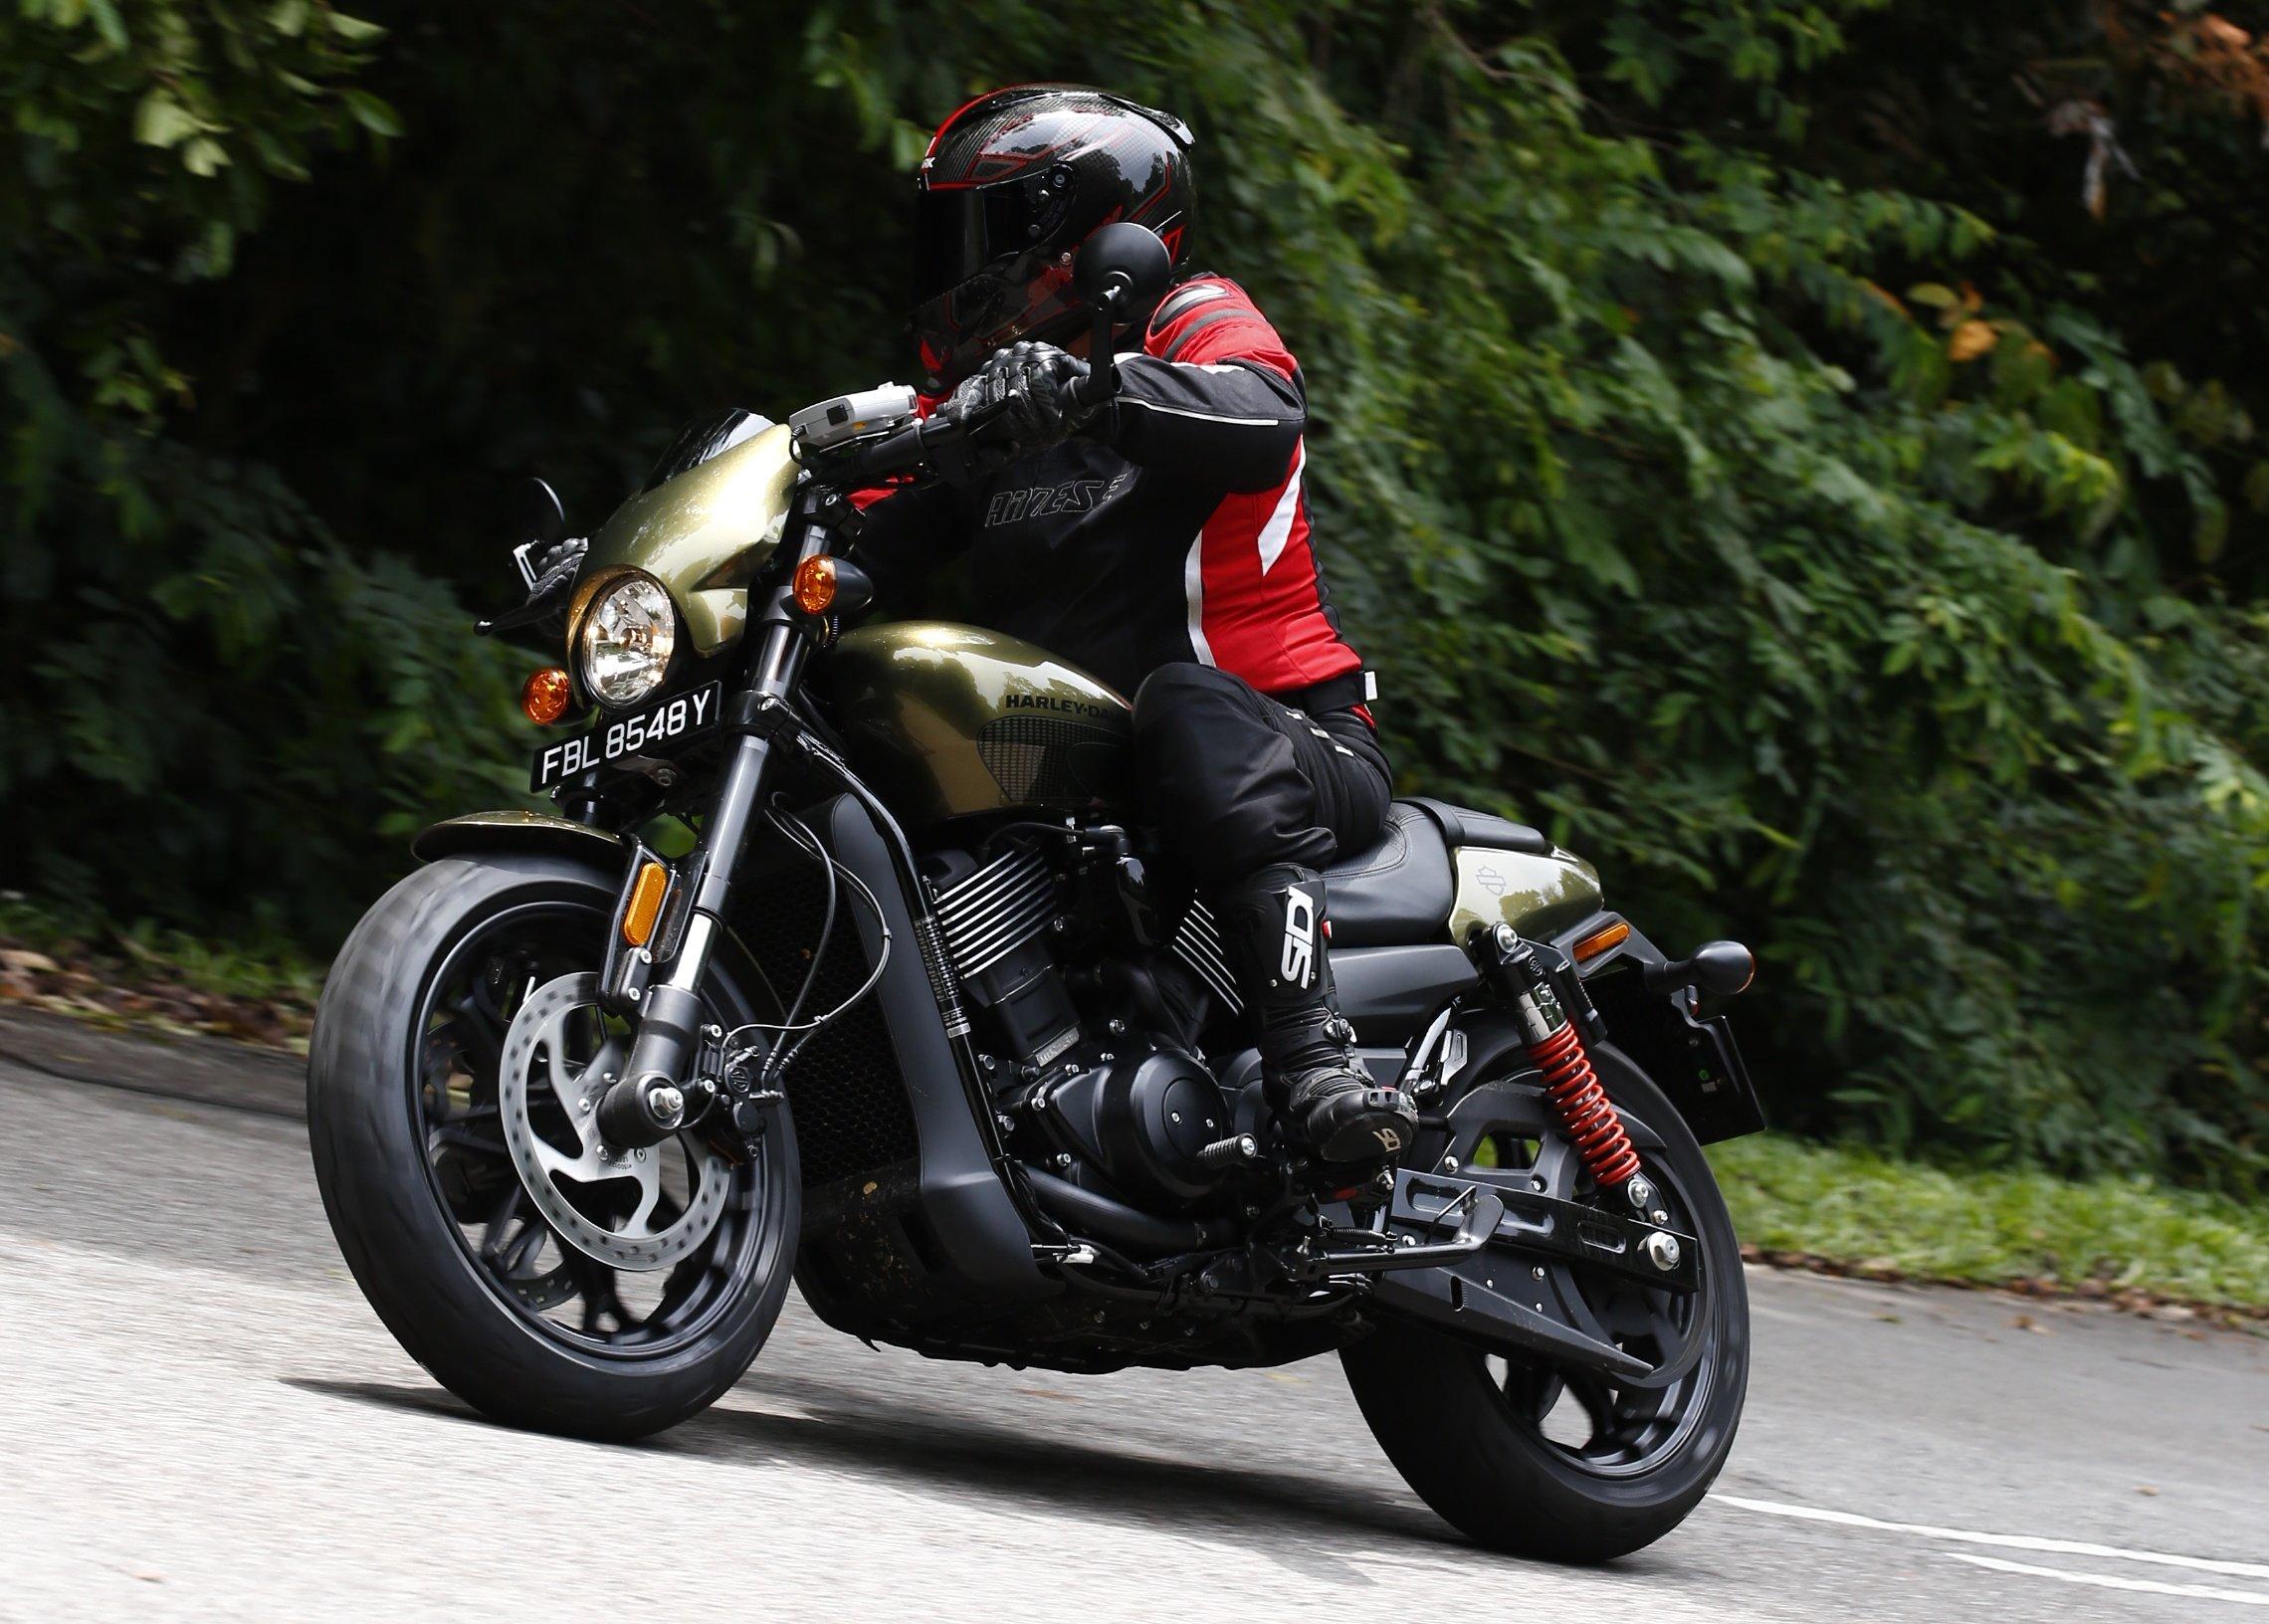 Harley Davidson: VIDEO: 2017 Harley-Davidson Street Rod Walk-around